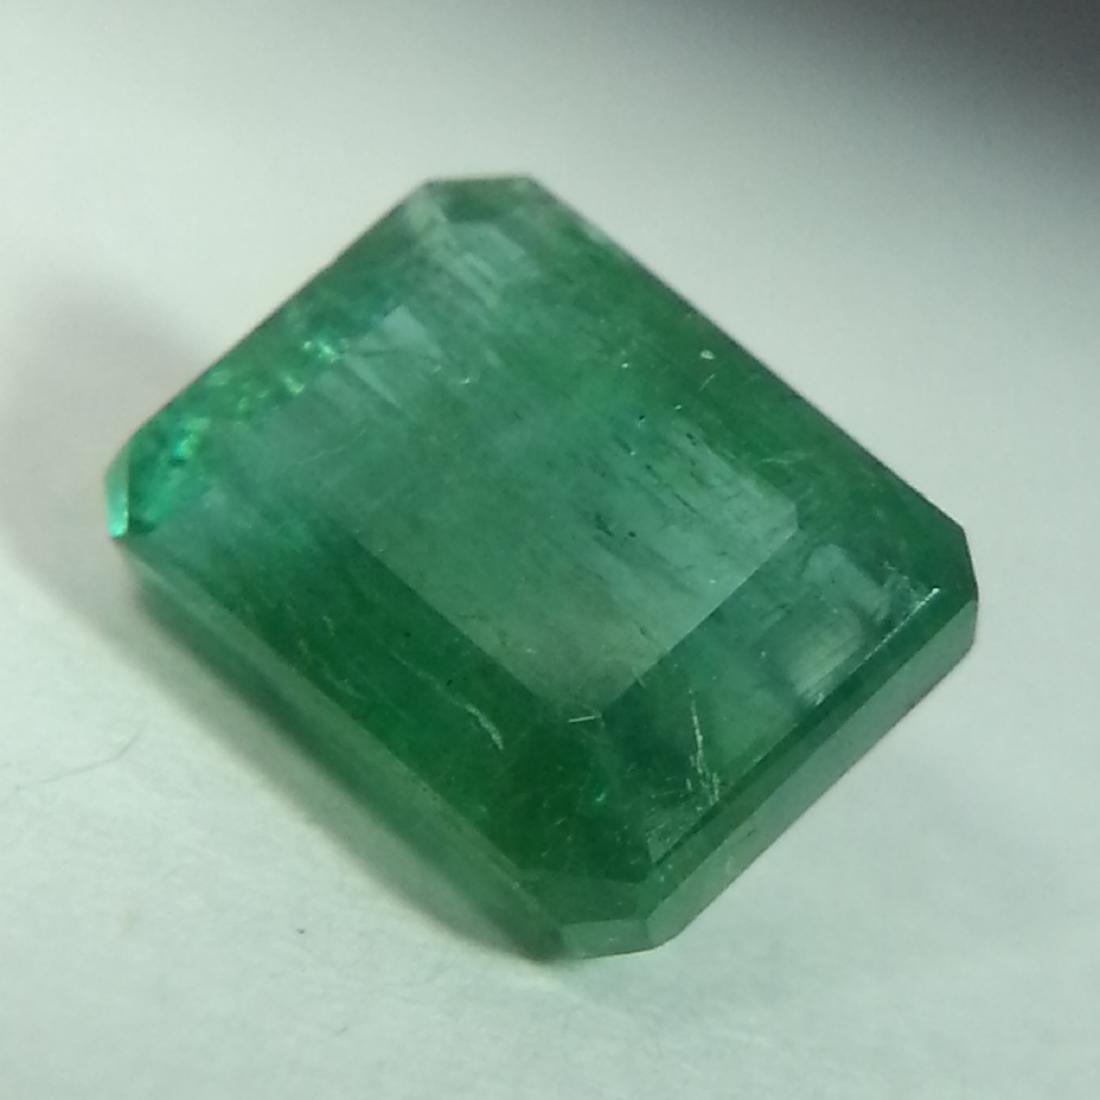 Emerald - 2.46 ct - 3